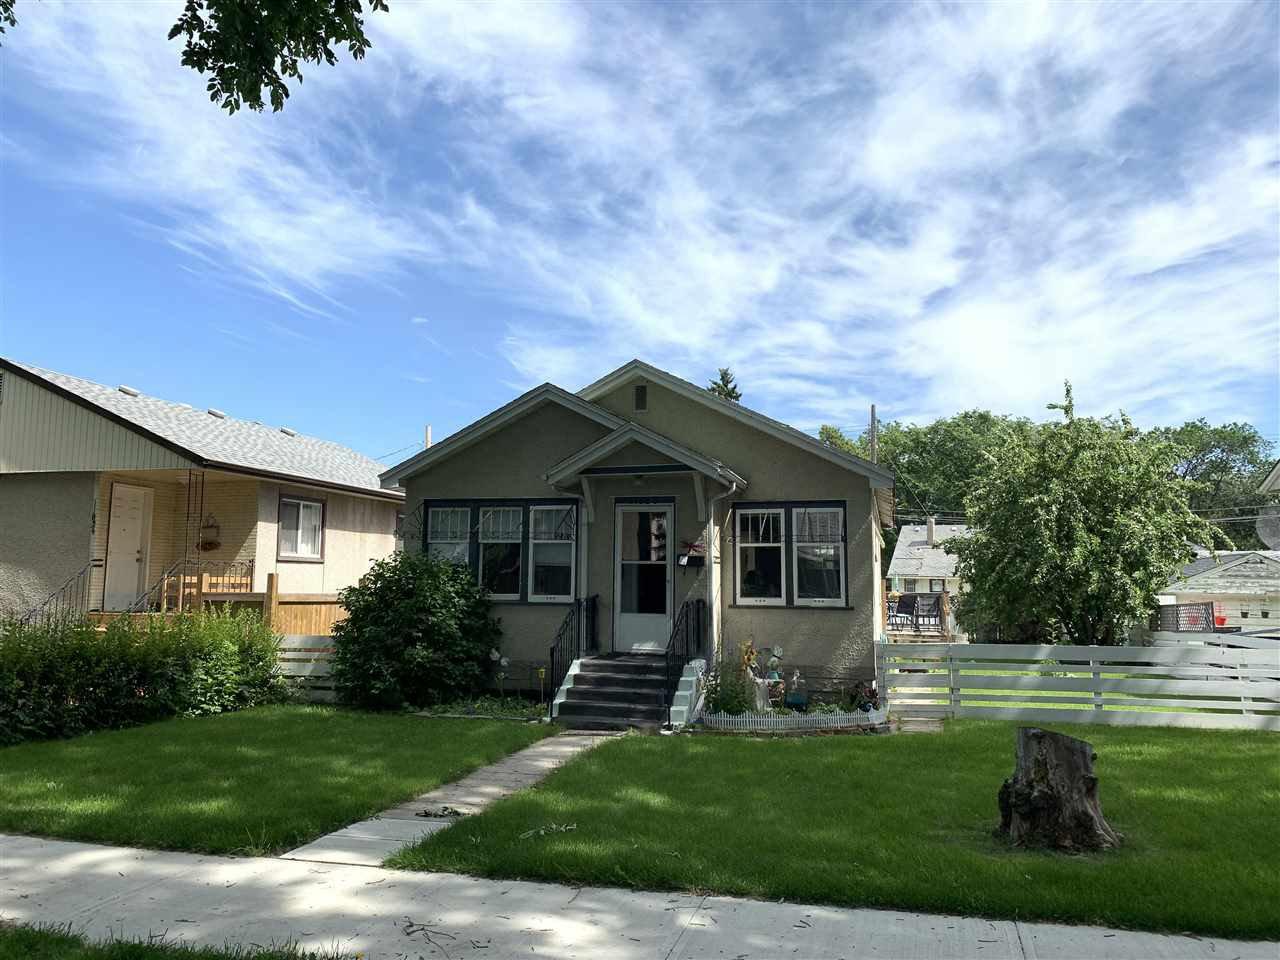 Main Photo: 11825 61 Street in Edmonton: Zone 06 House for sale : MLS®# E4166718